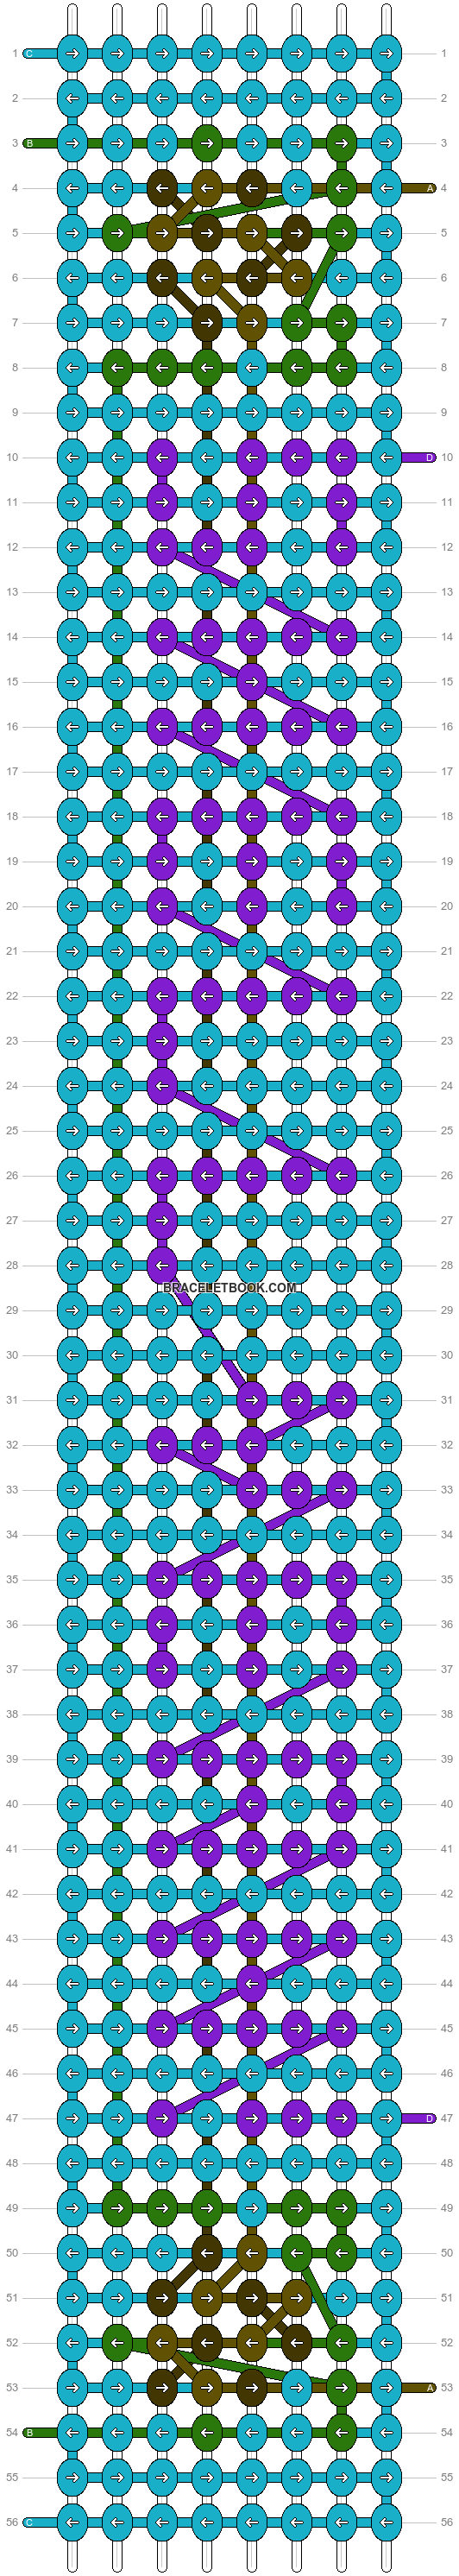 Alpha pattern #90653 pattern